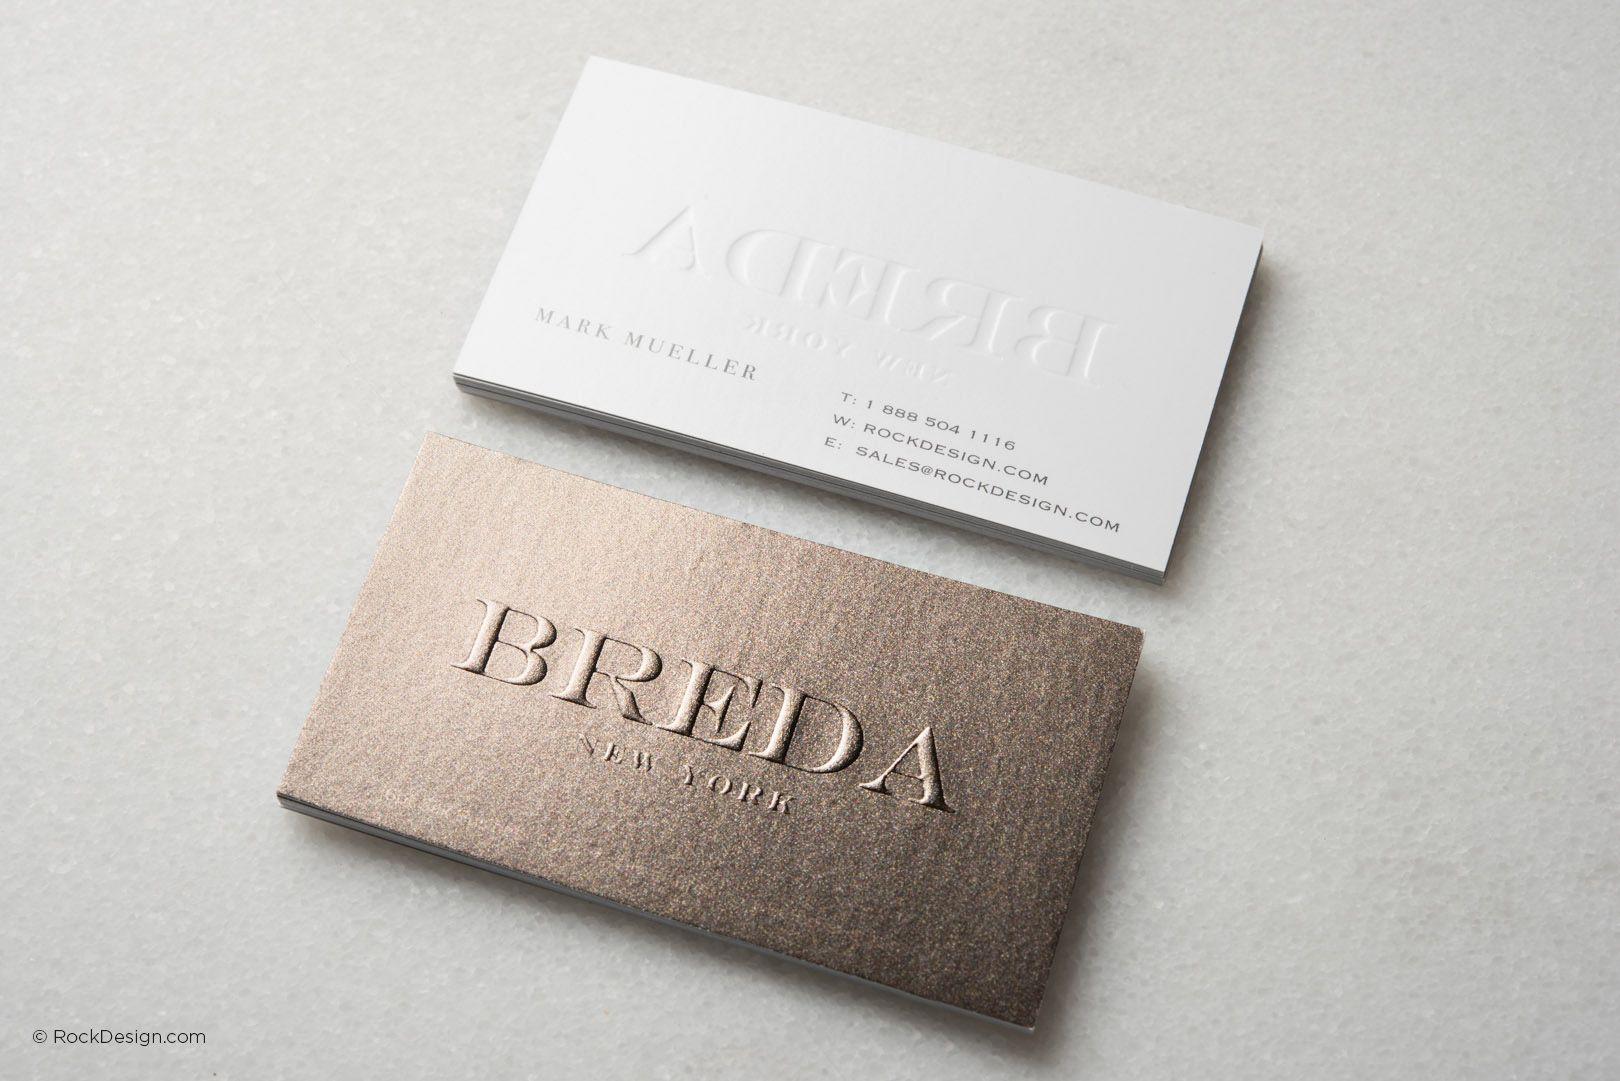 Sparkling modern business card template - Breda | RockDesign ...